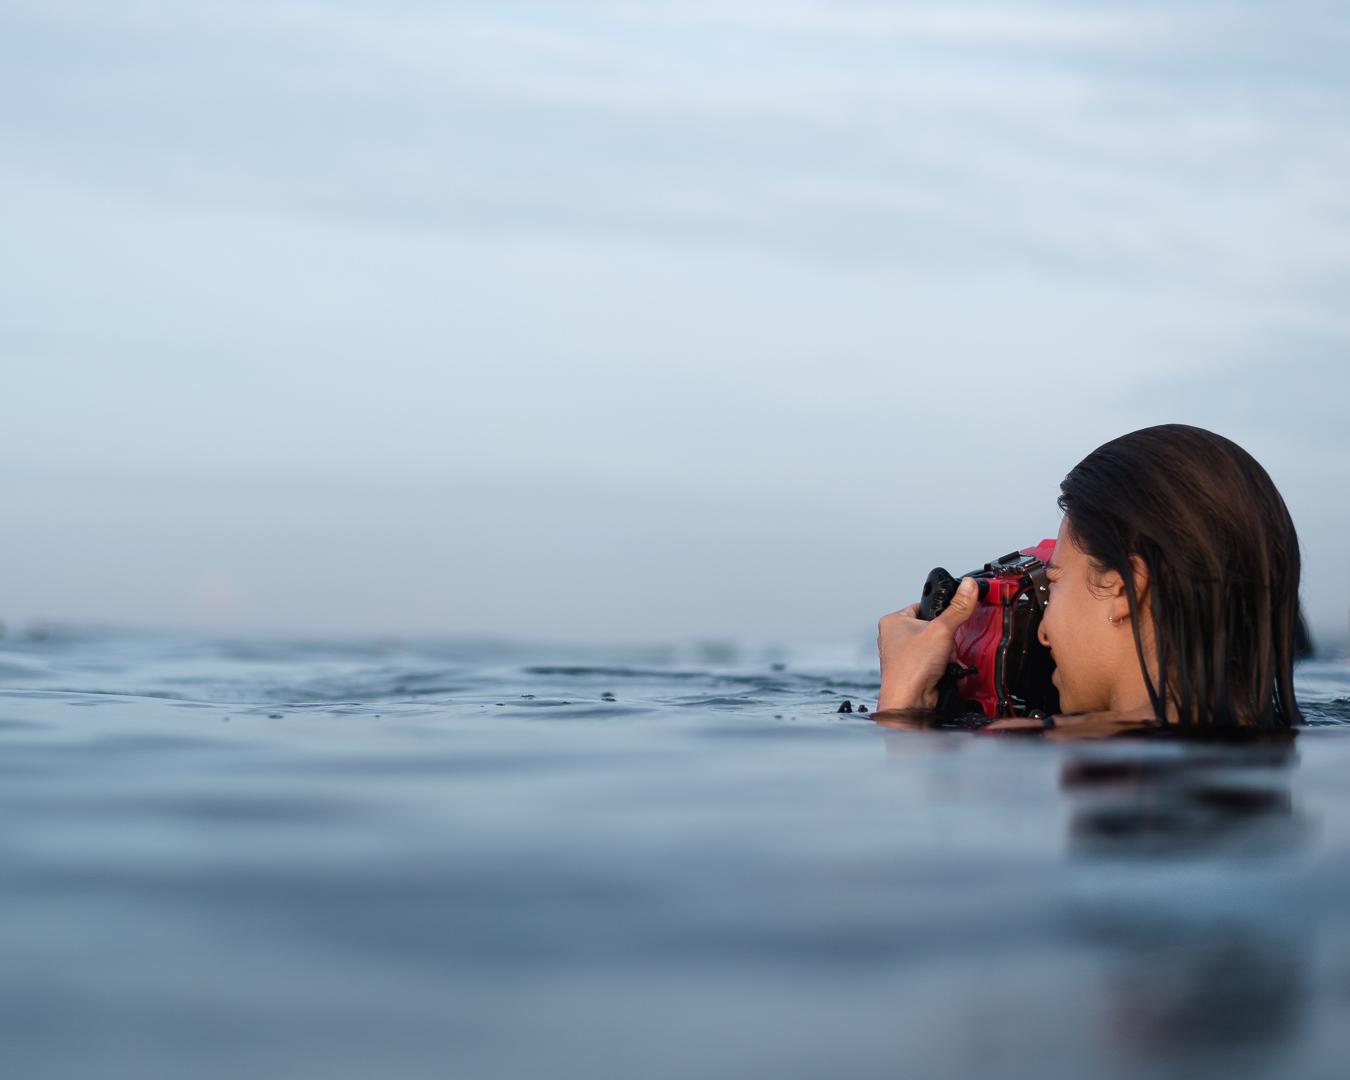 Alexa with her Aquatech underwater housing.